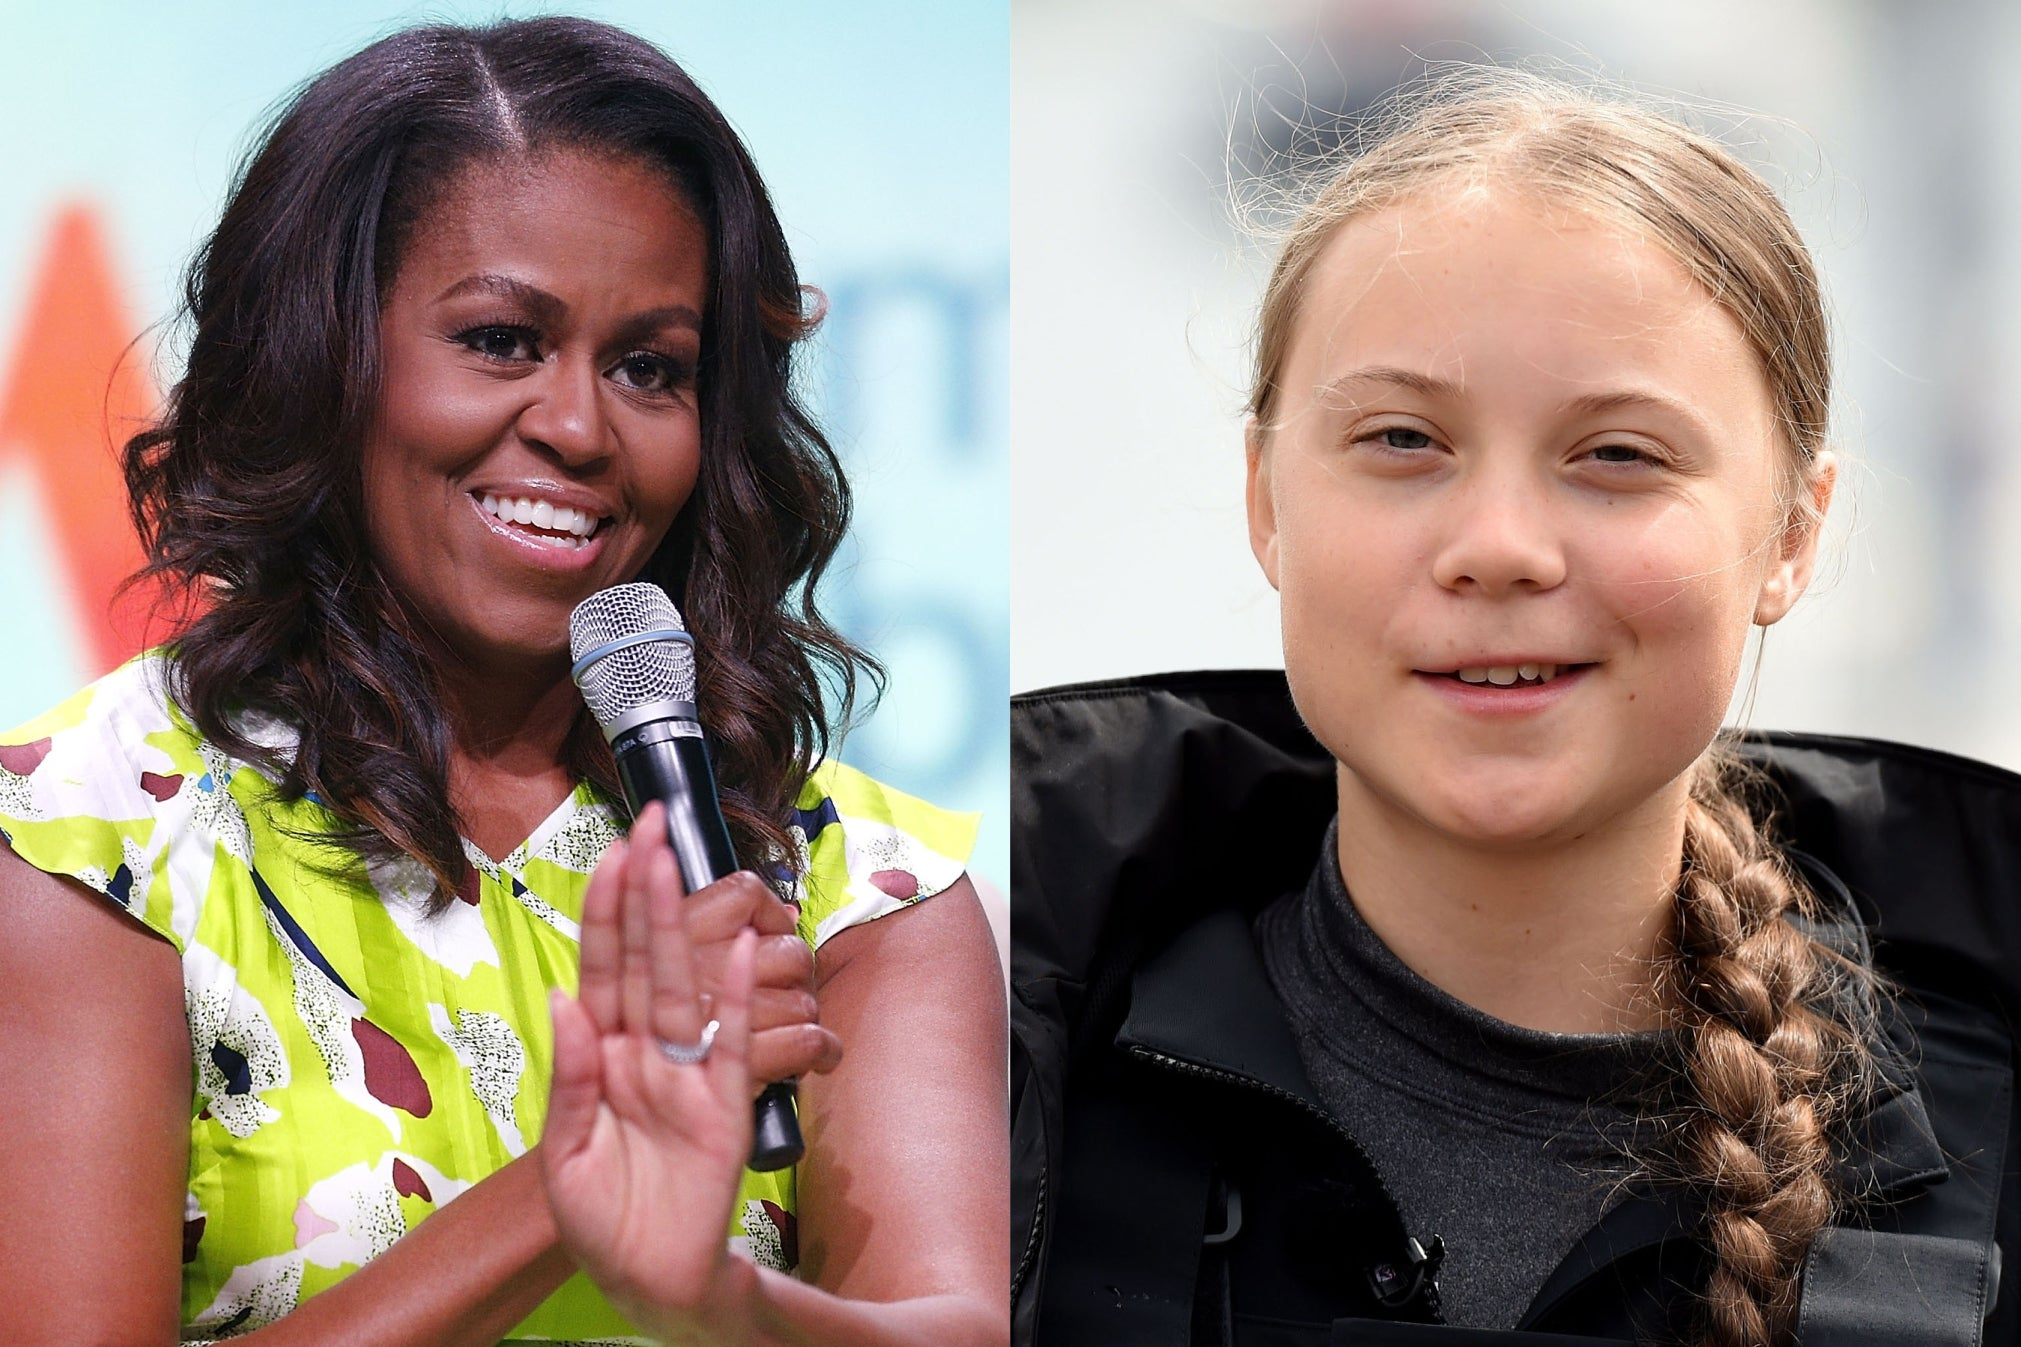 Michelle Obama supports Greta Thunberg after Donald Trump attacks teen activist